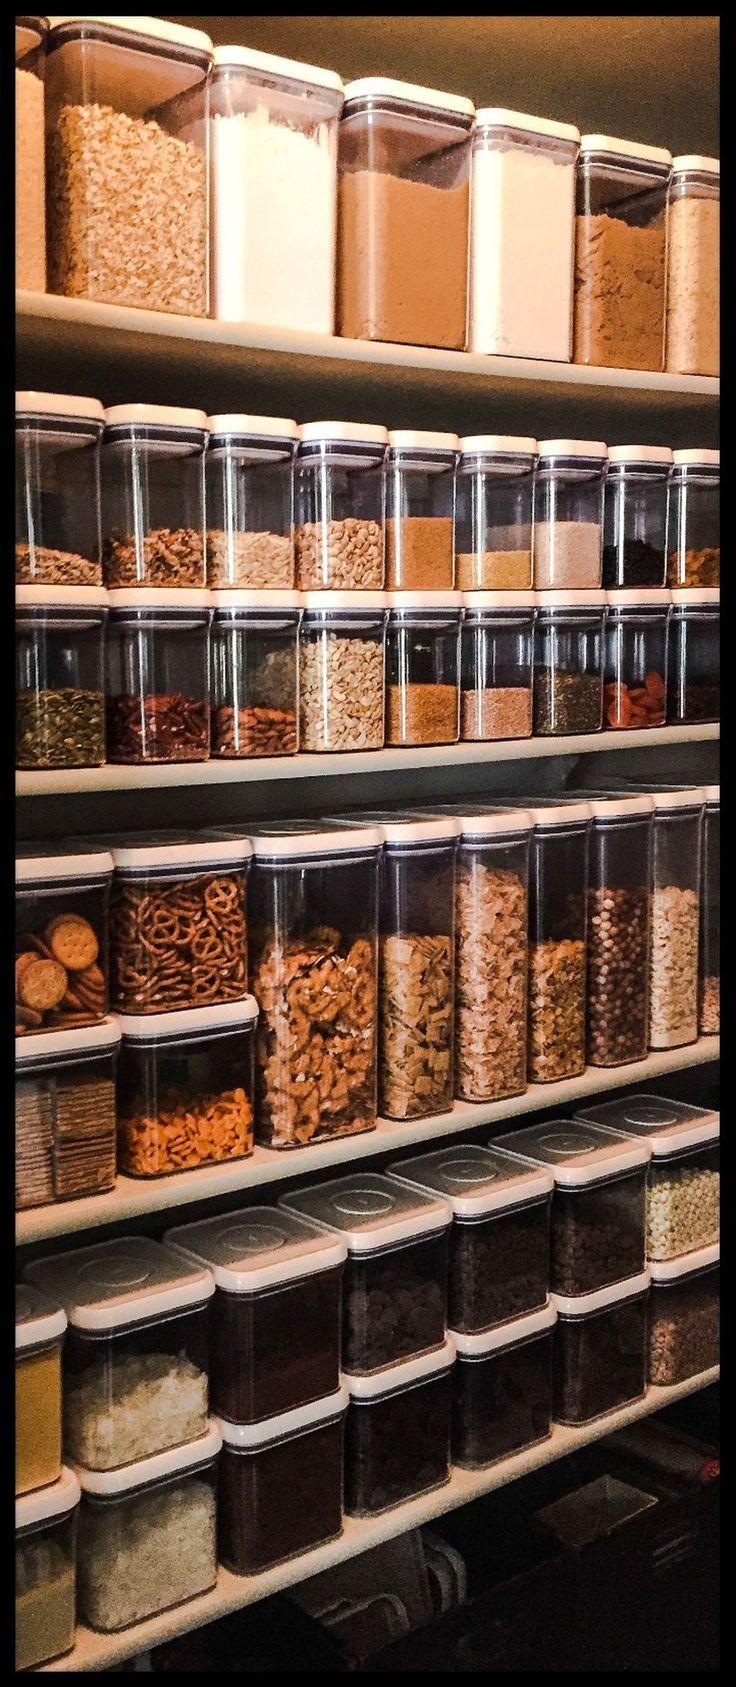 nice 75 Creative and Efficient Space Saving Kitchen Organization Ideas https://decoralink.com/2017/10/10/75-creative-efficient-space-saving-kitchen-organization-ideas/